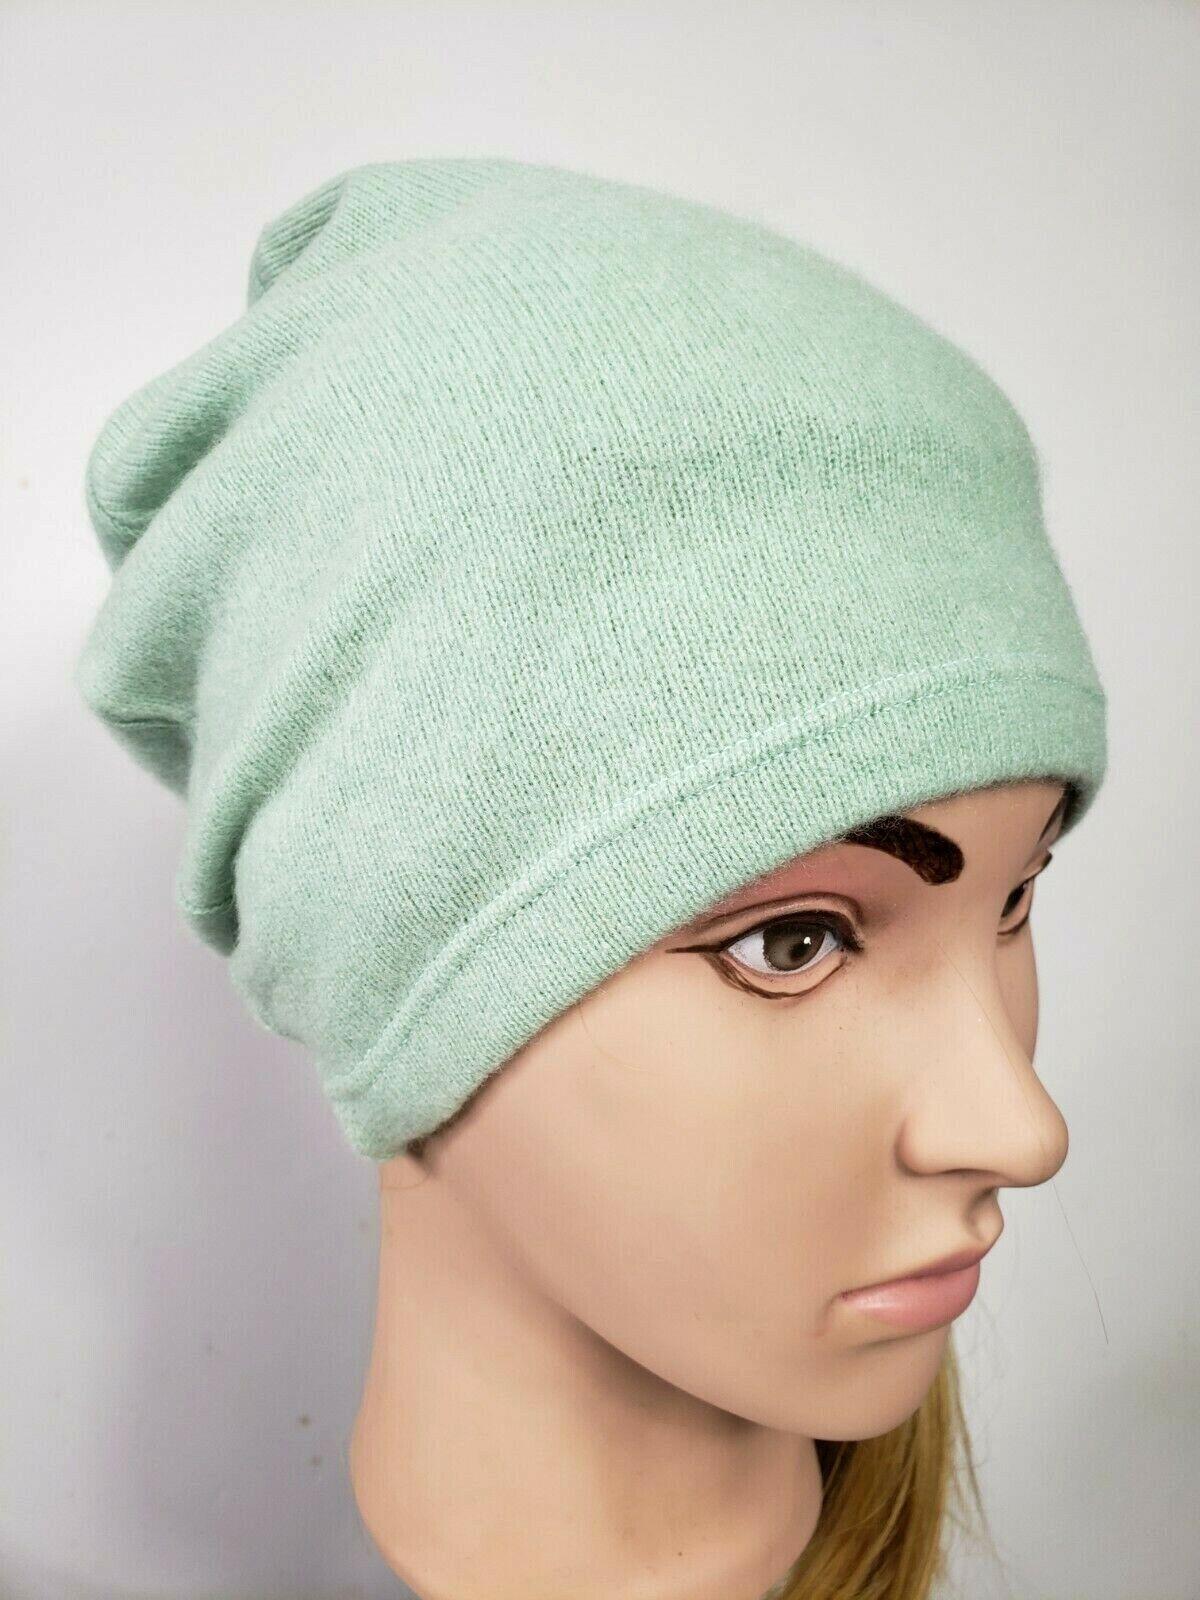 # 100% Pure Cashmere Sombrero Gorro de lana hecho a mano unisex para hombre mujer Menta Azul 320